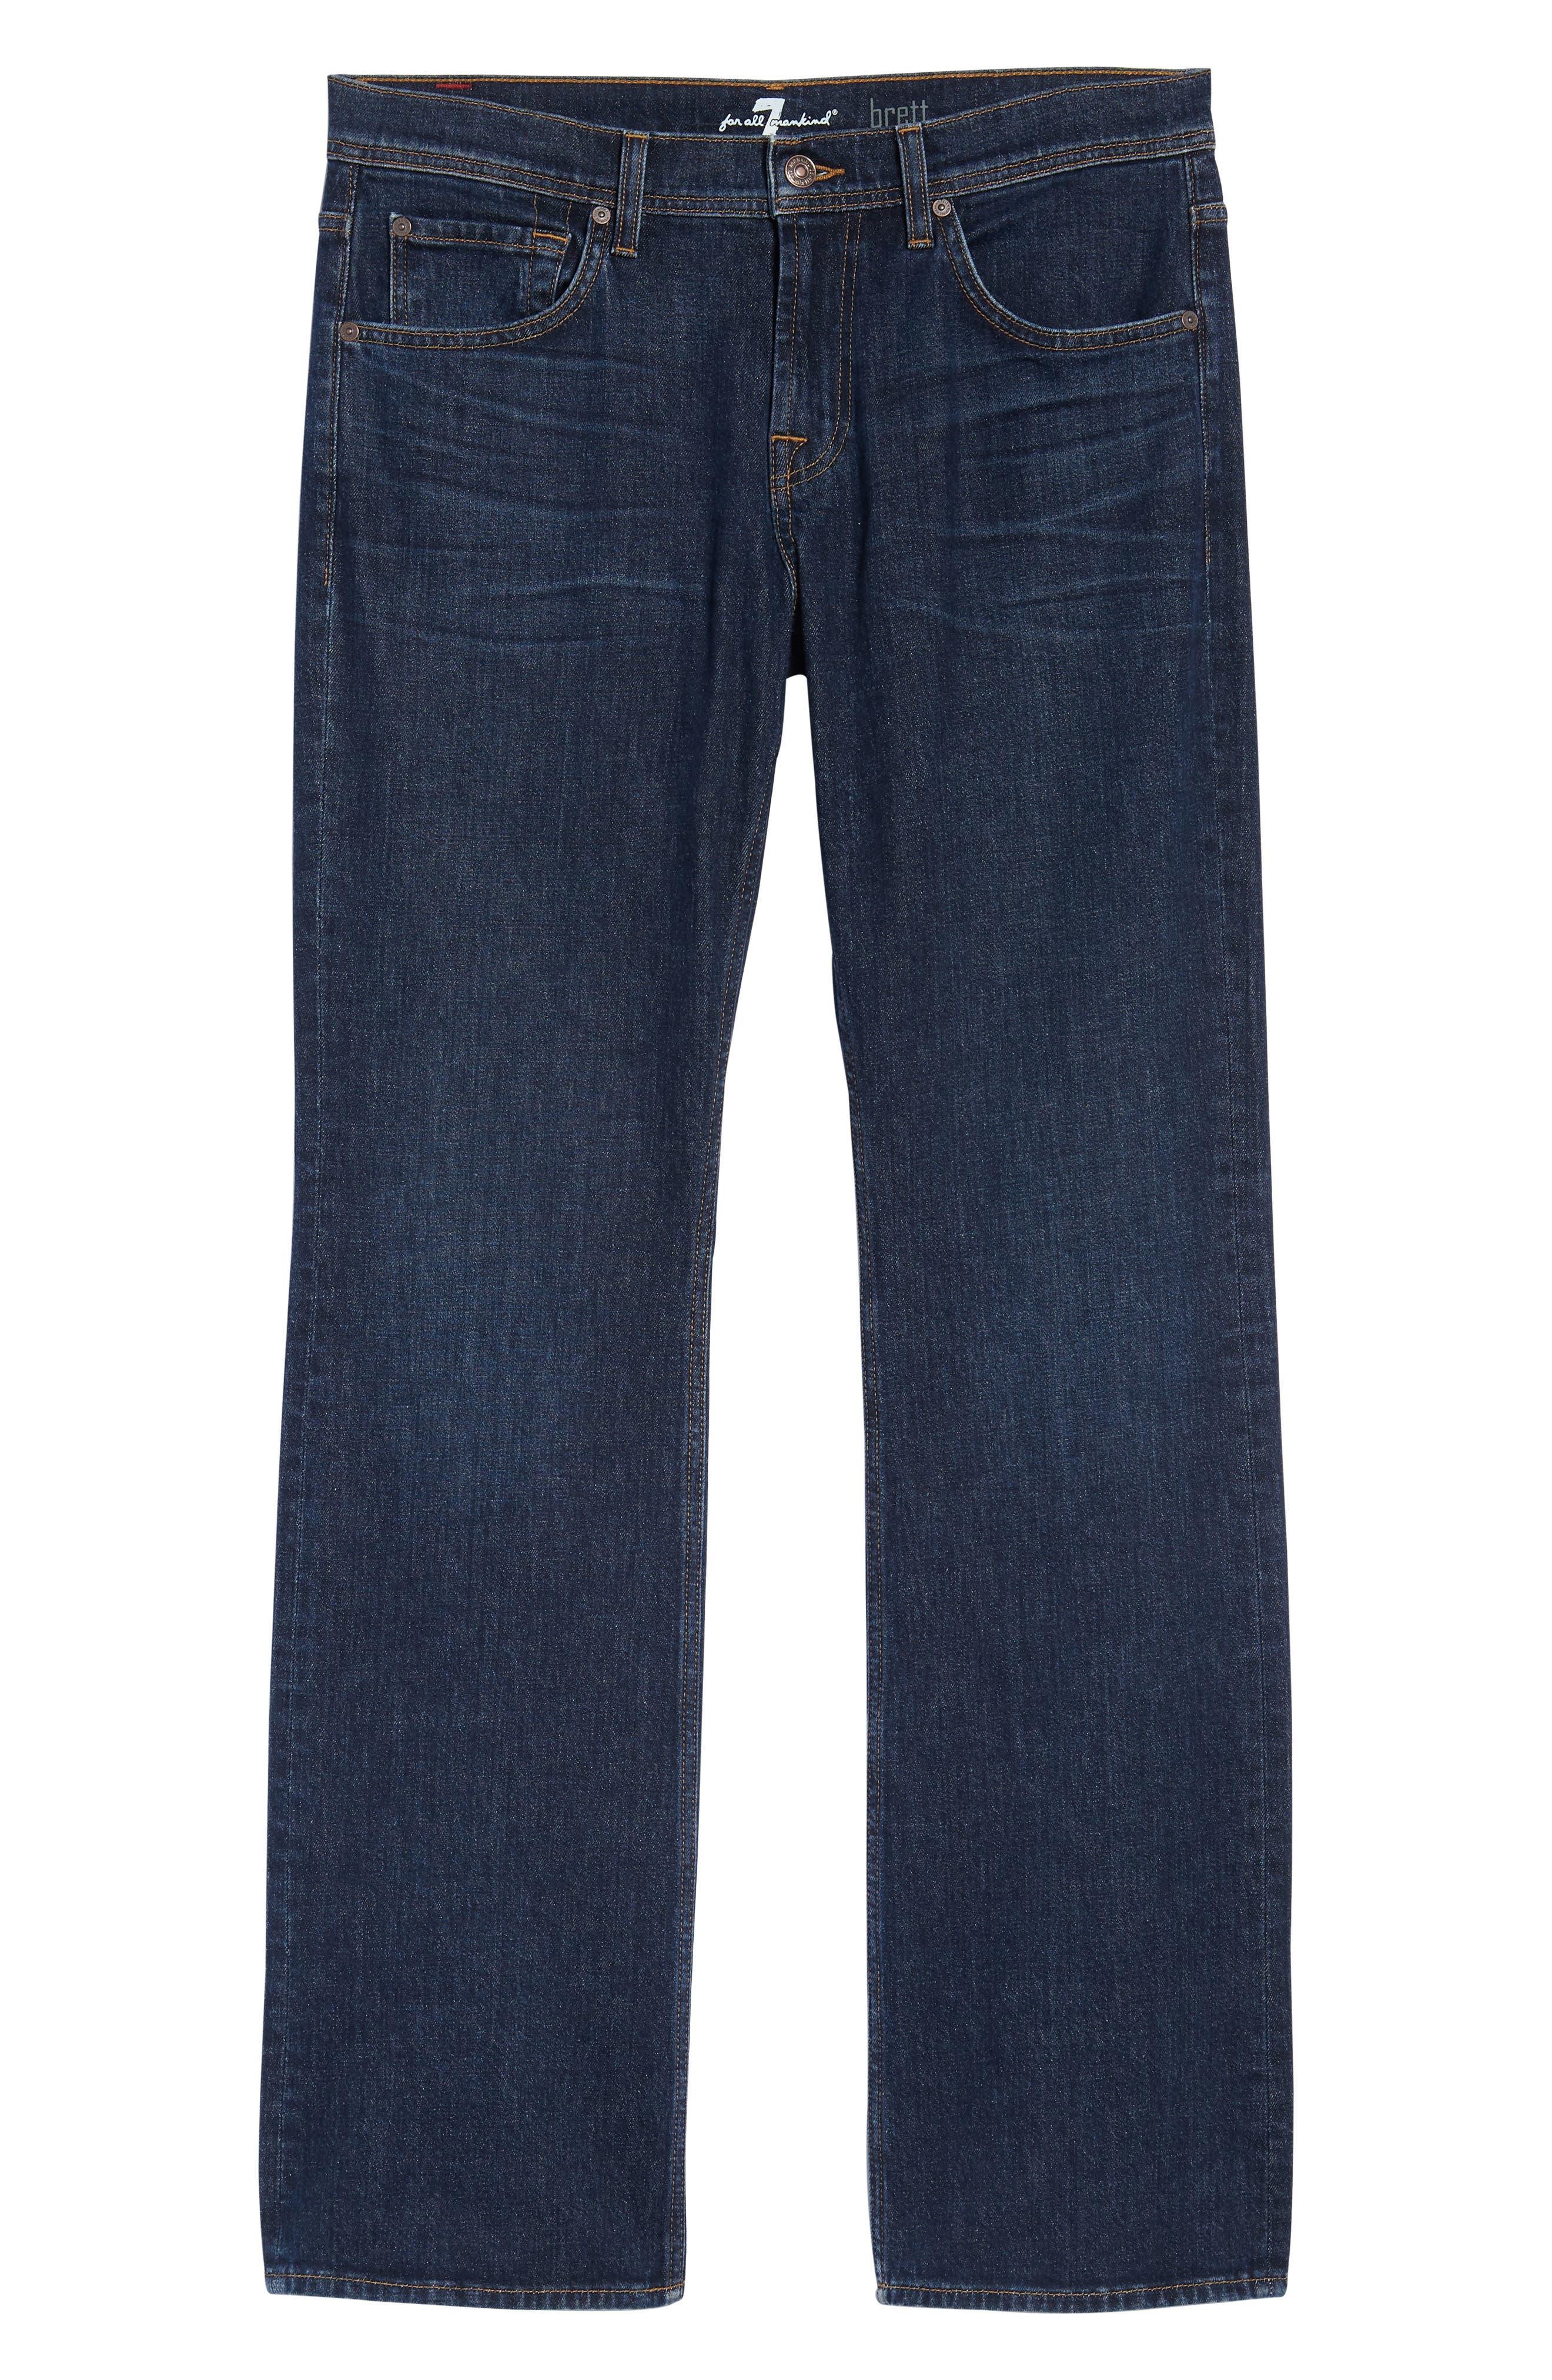 Brett Bootcut Jeans,                             Alternate thumbnail 6, color,                             Forfeit